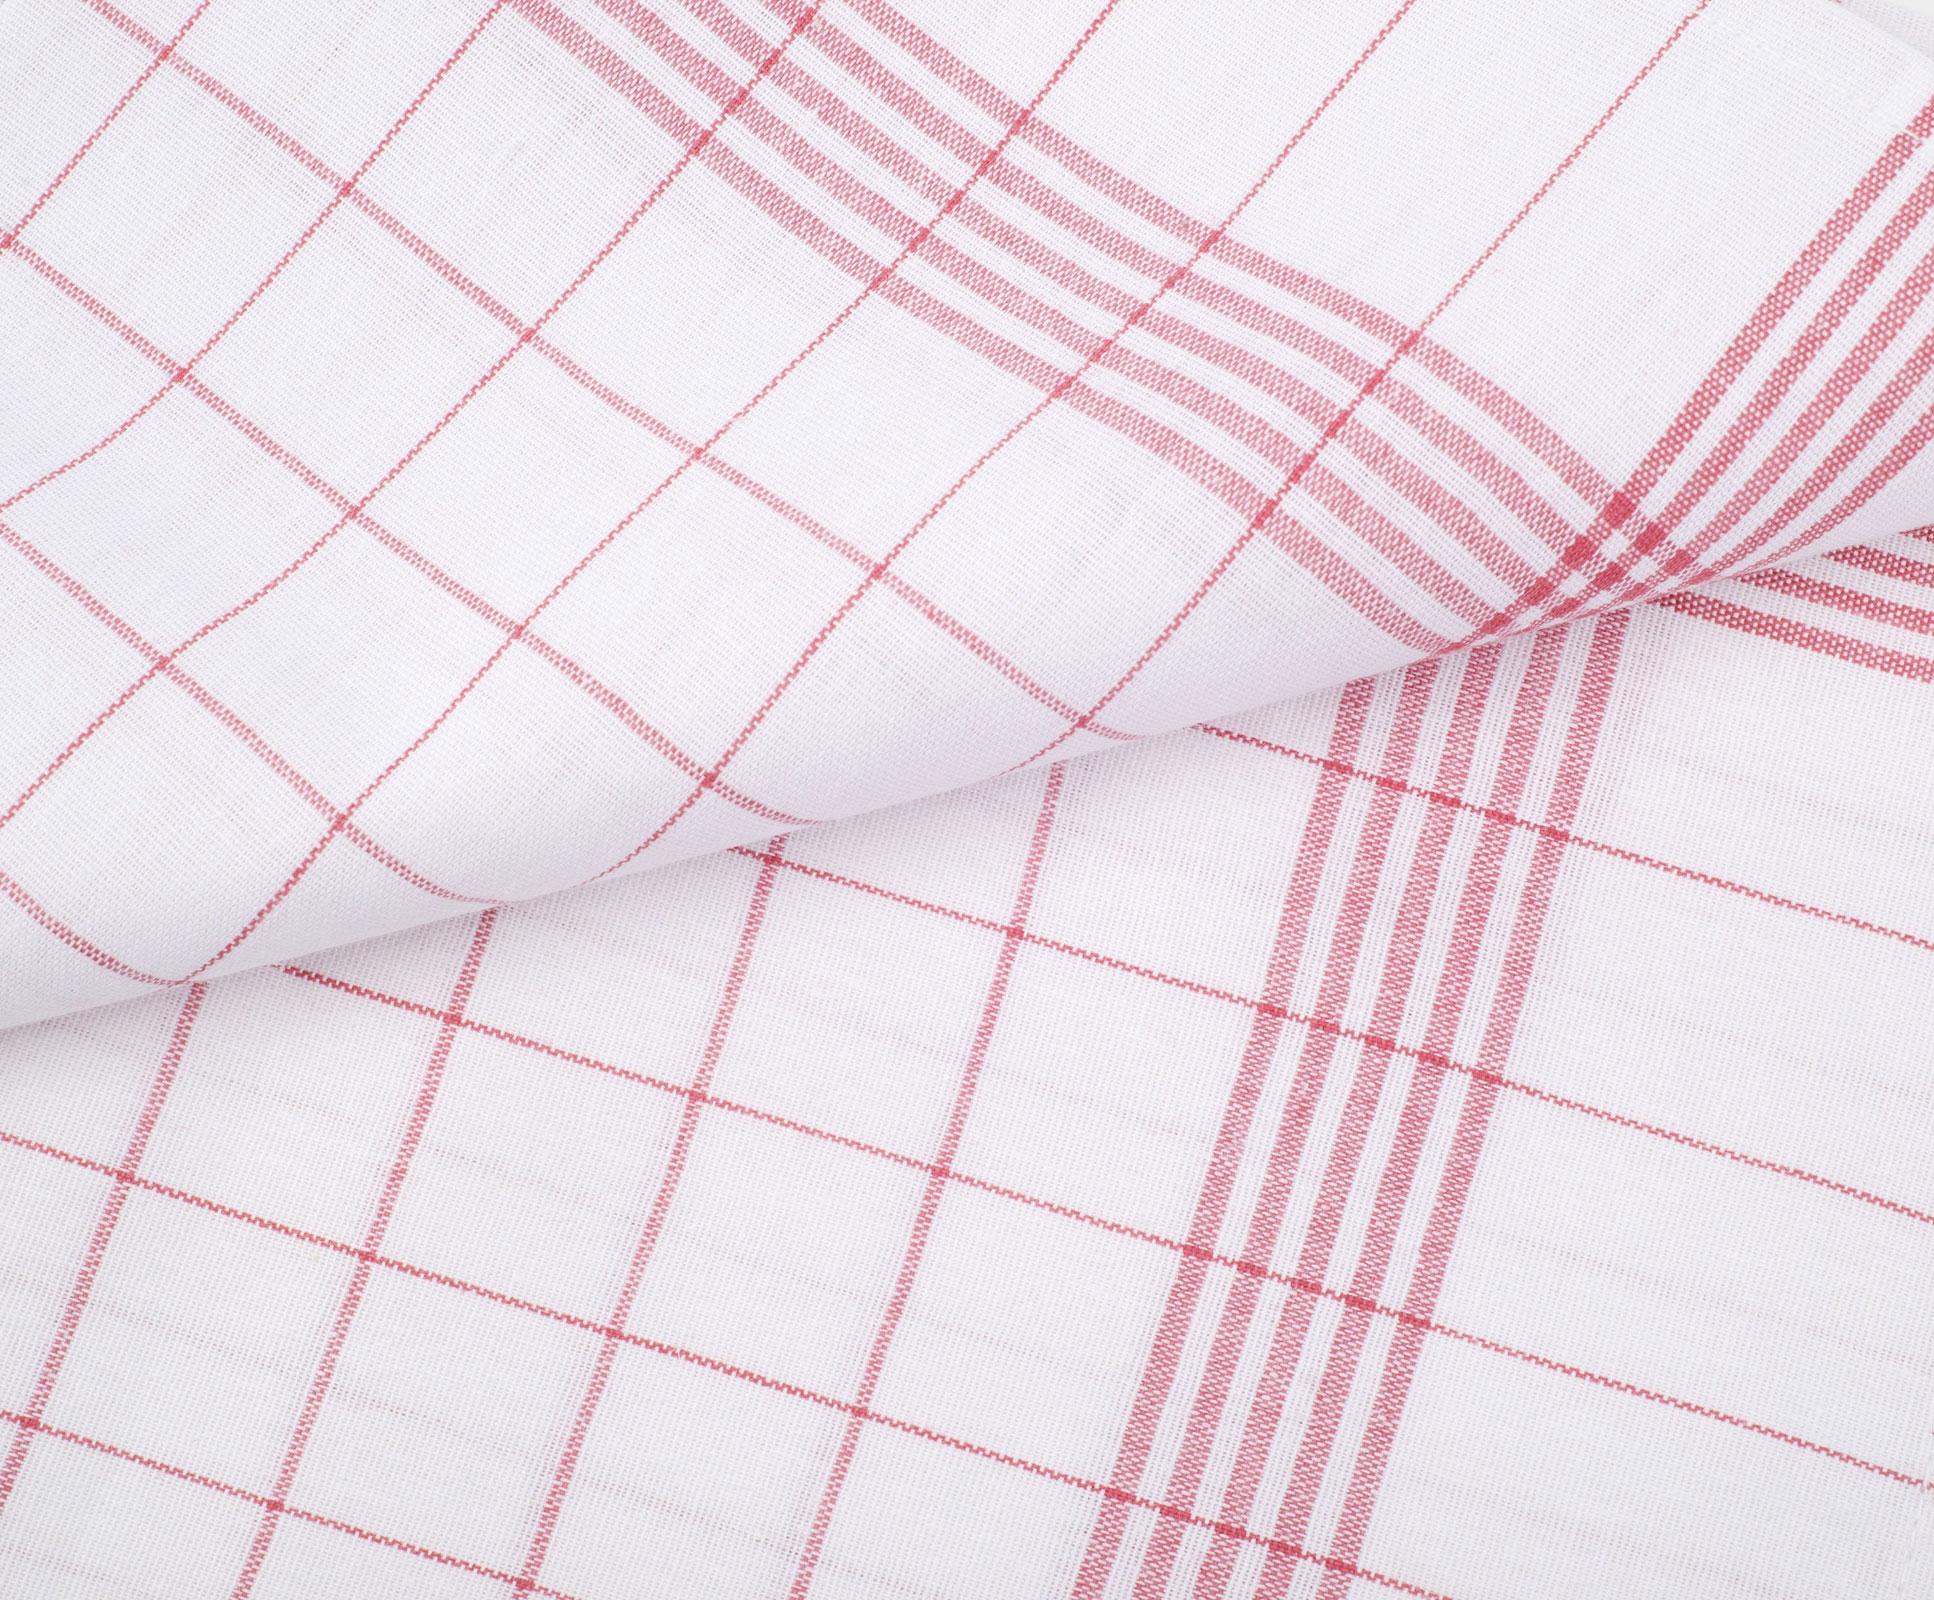 Küchentextilien - 10er Pack Gözze Geschirrtücher 50x70 100 Baumwolle kochfest weiß rot  - Onlineshop PremiumShop321